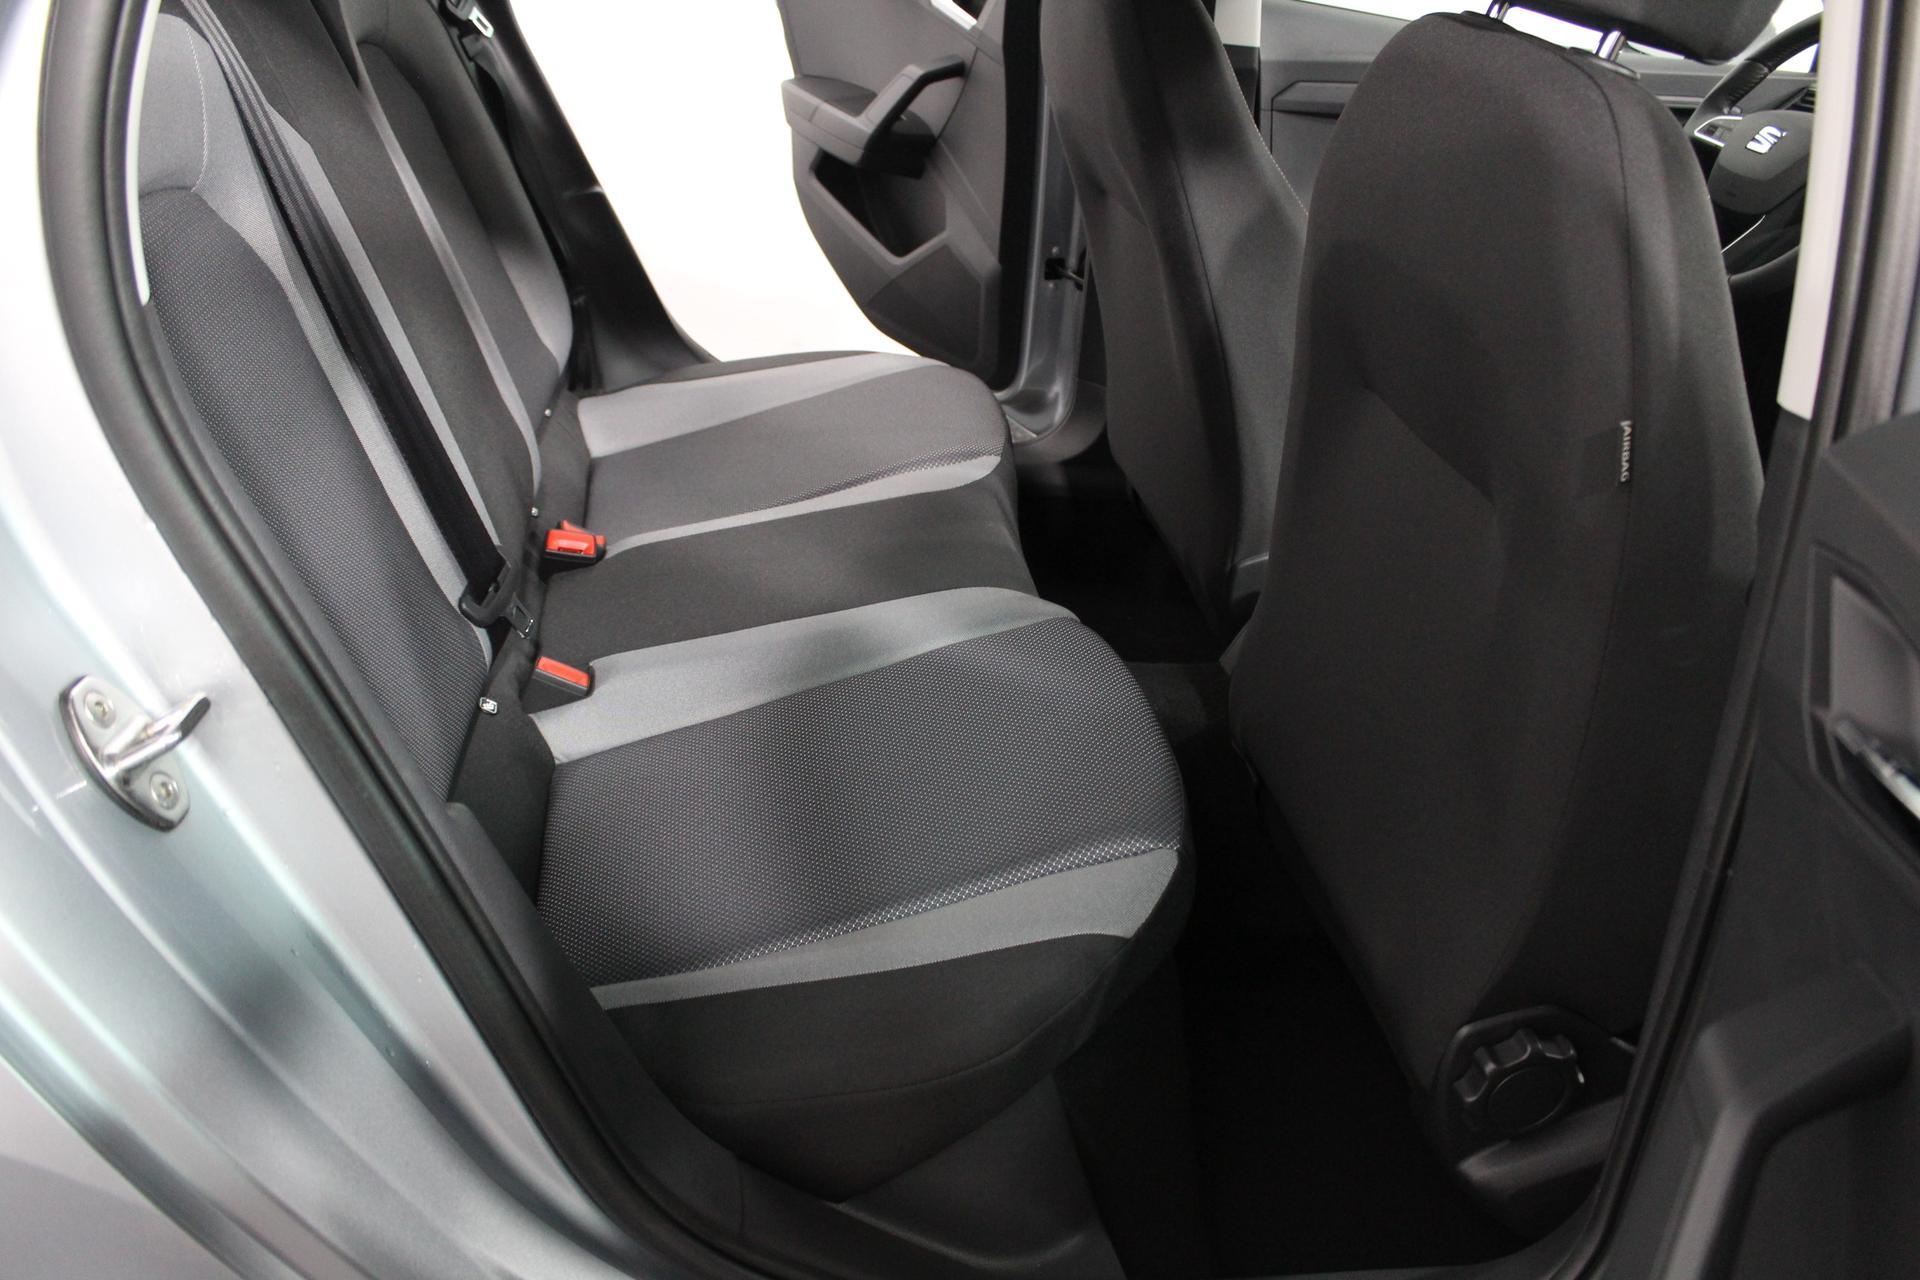 seat ibiza style neues modell klimaautomatik tempomat. Black Bedroom Furniture Sets. Home Design Ideas